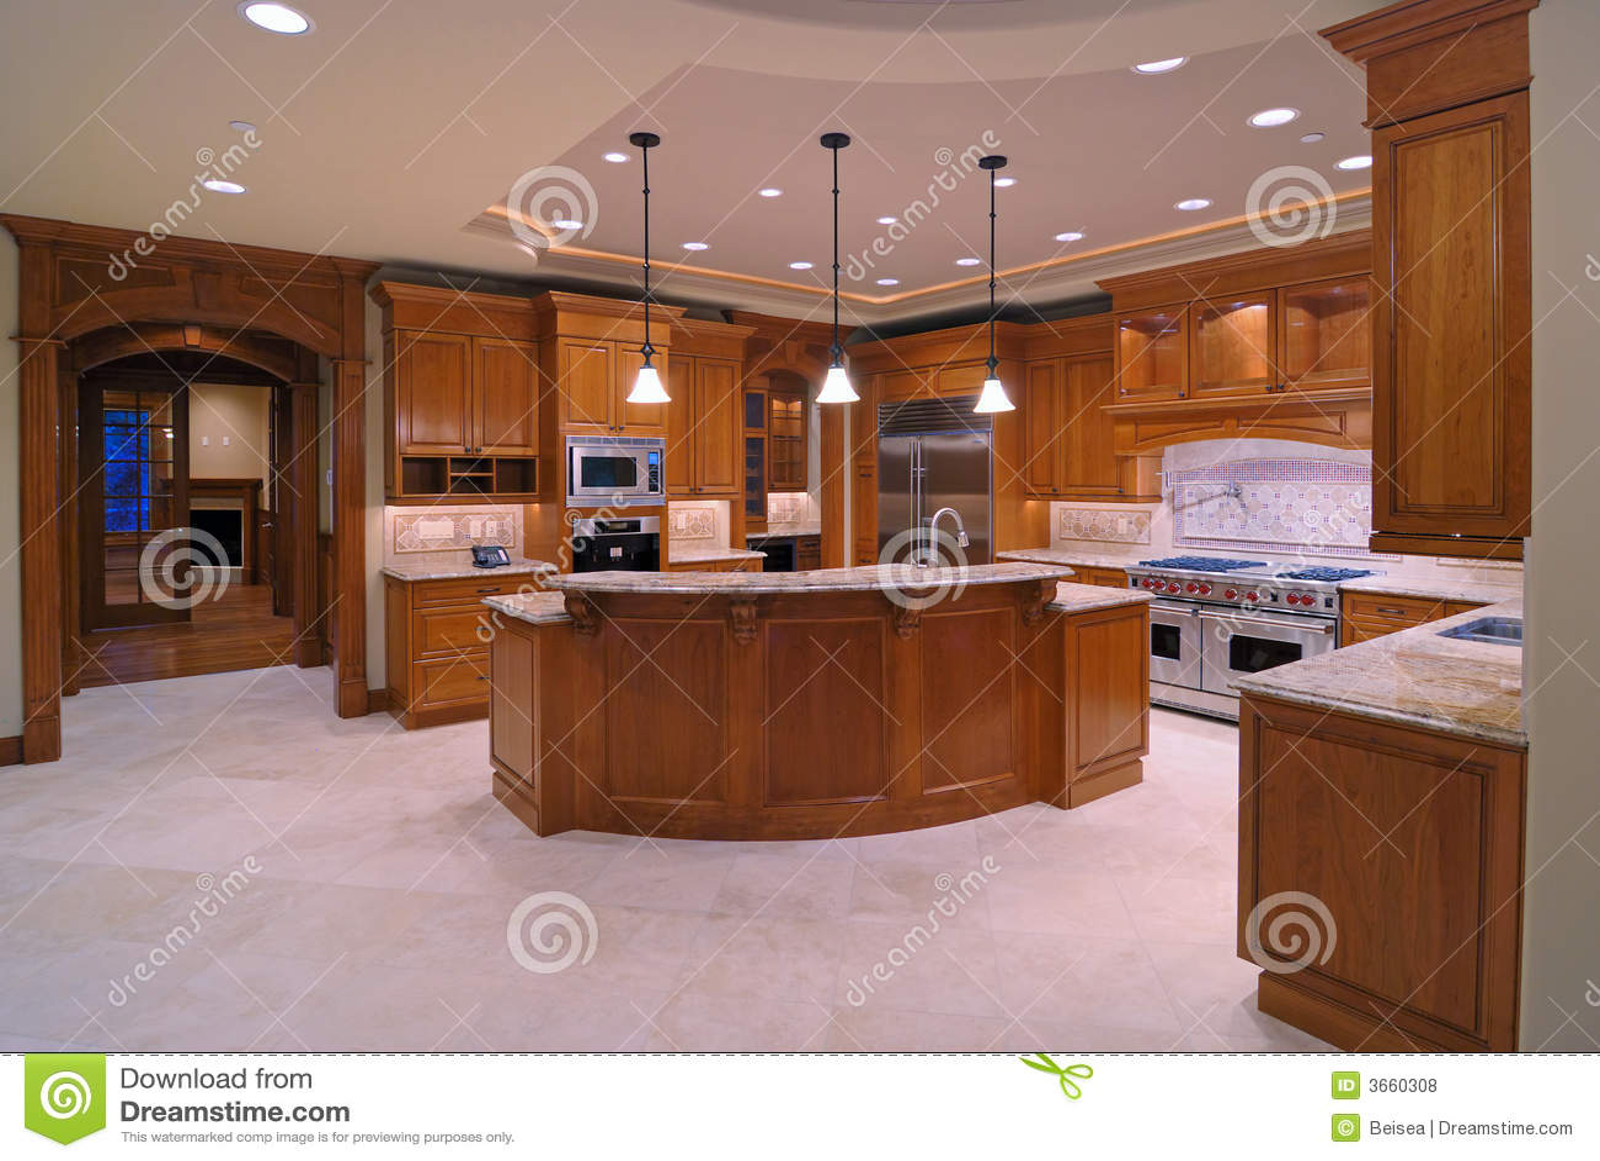 Amerikaanse keukens royalty vrije stock foto 39 s beeld 3660308 - Moderne amerikaanse keuken ...